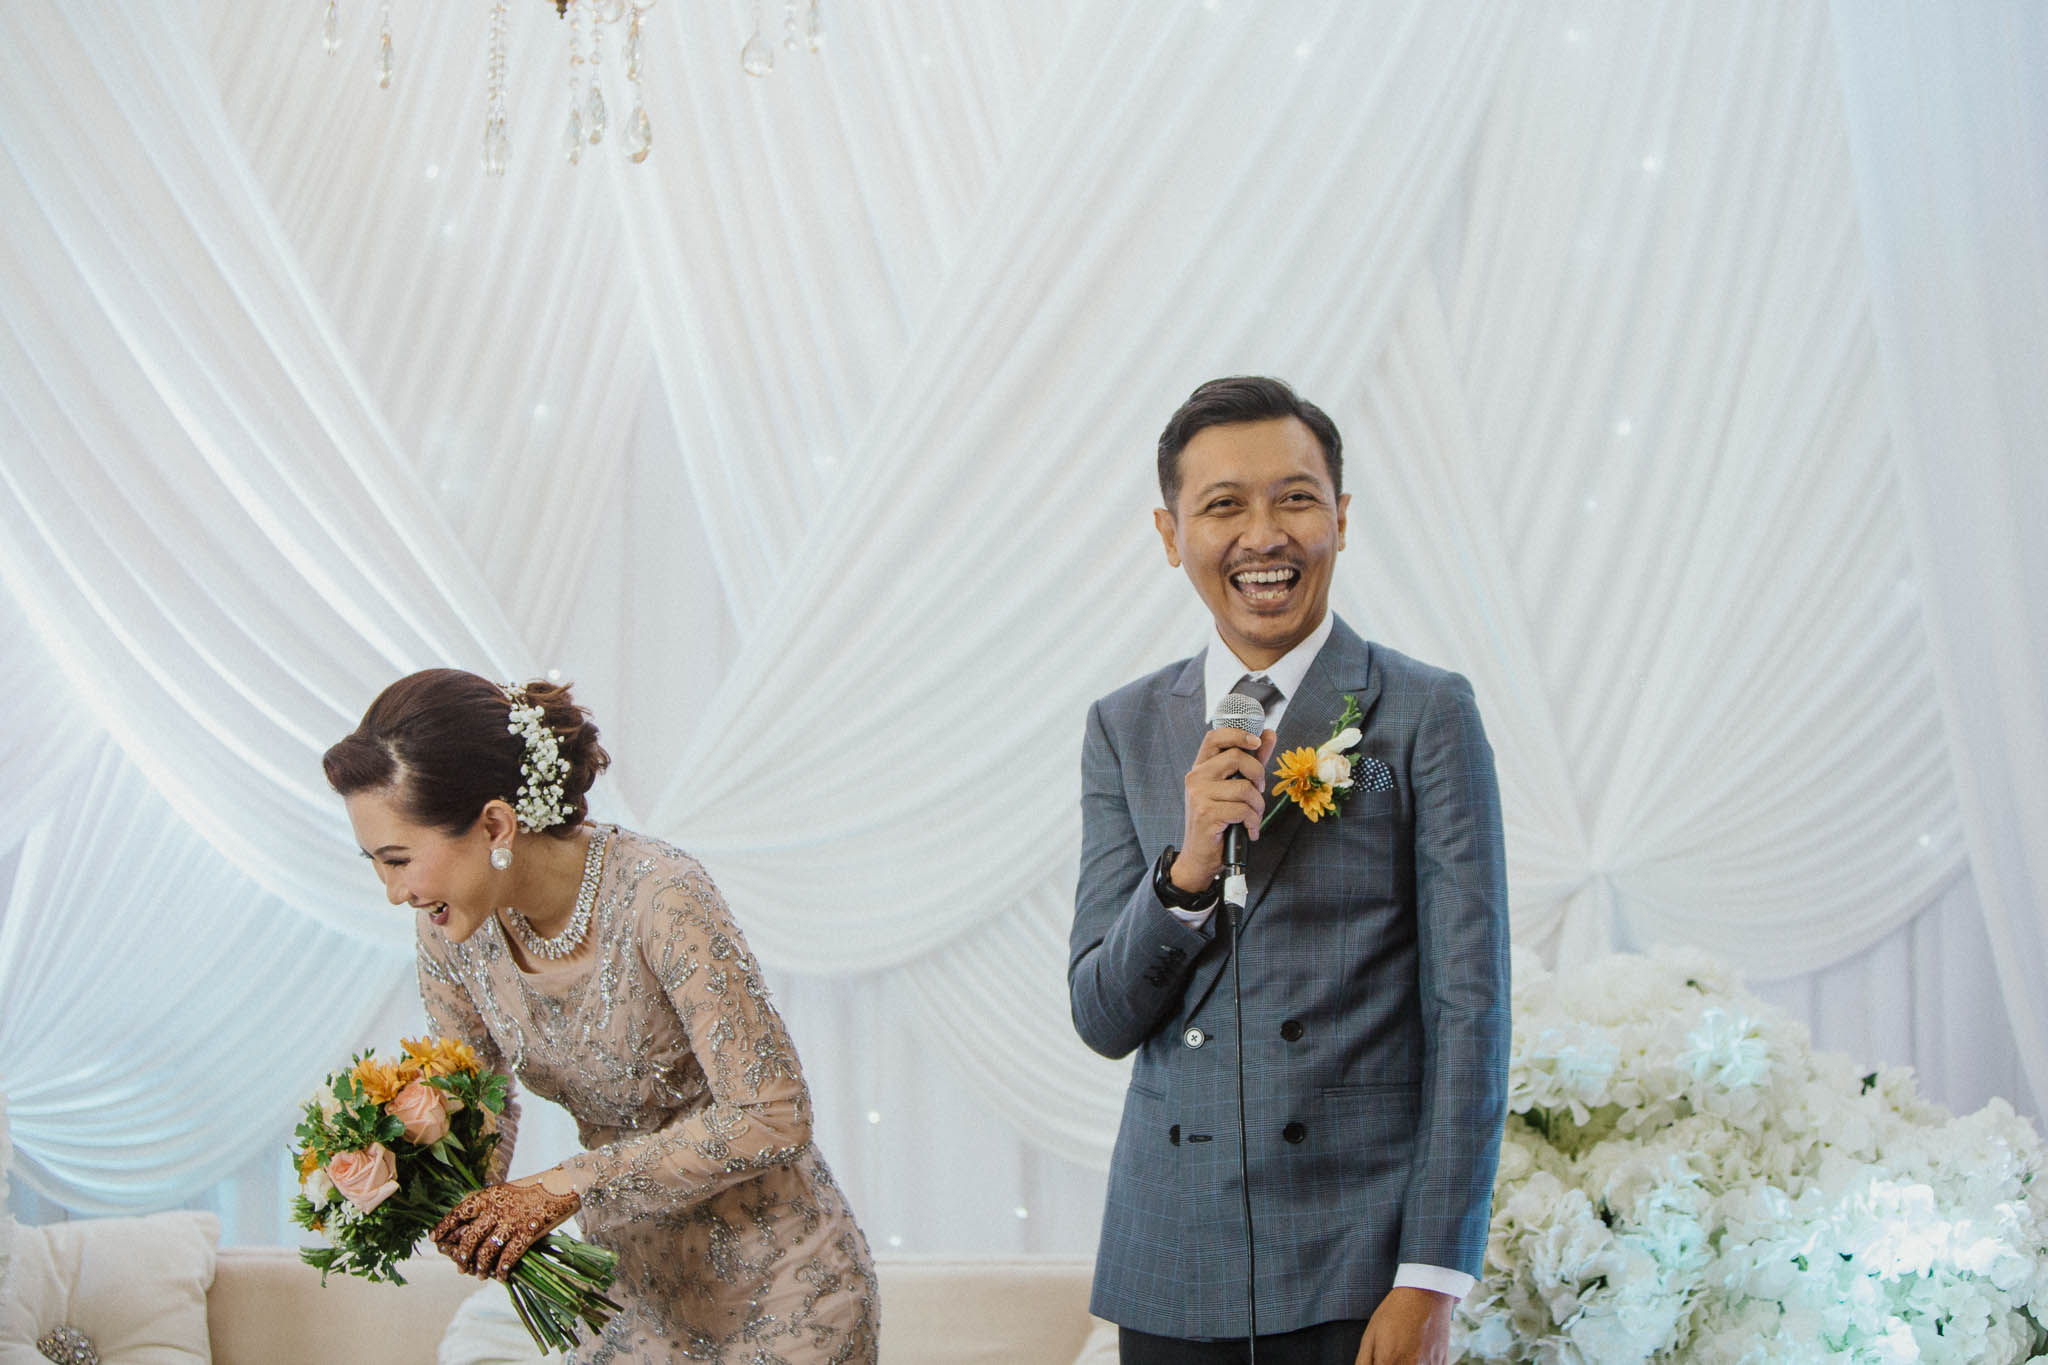 singapore-wedding-photographer-addafiq-nufail-058.jpg